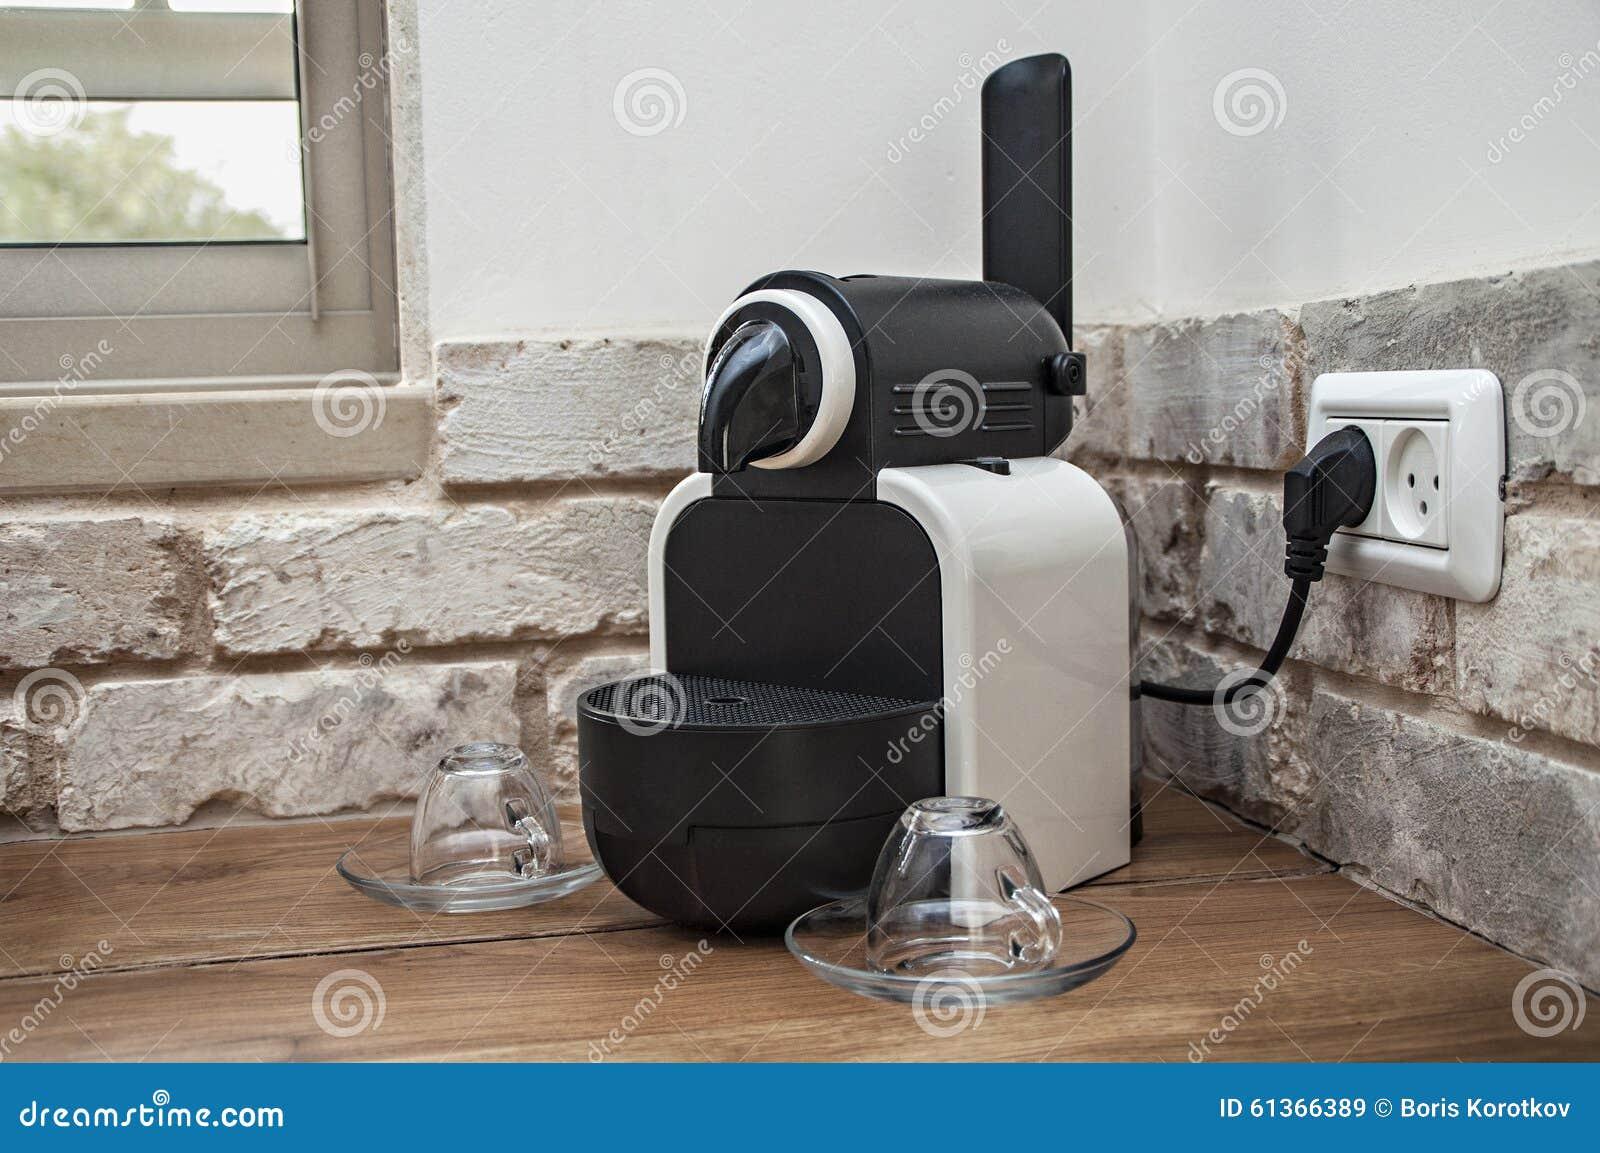 nespresso machine stock image image of stimulating machine 61366389